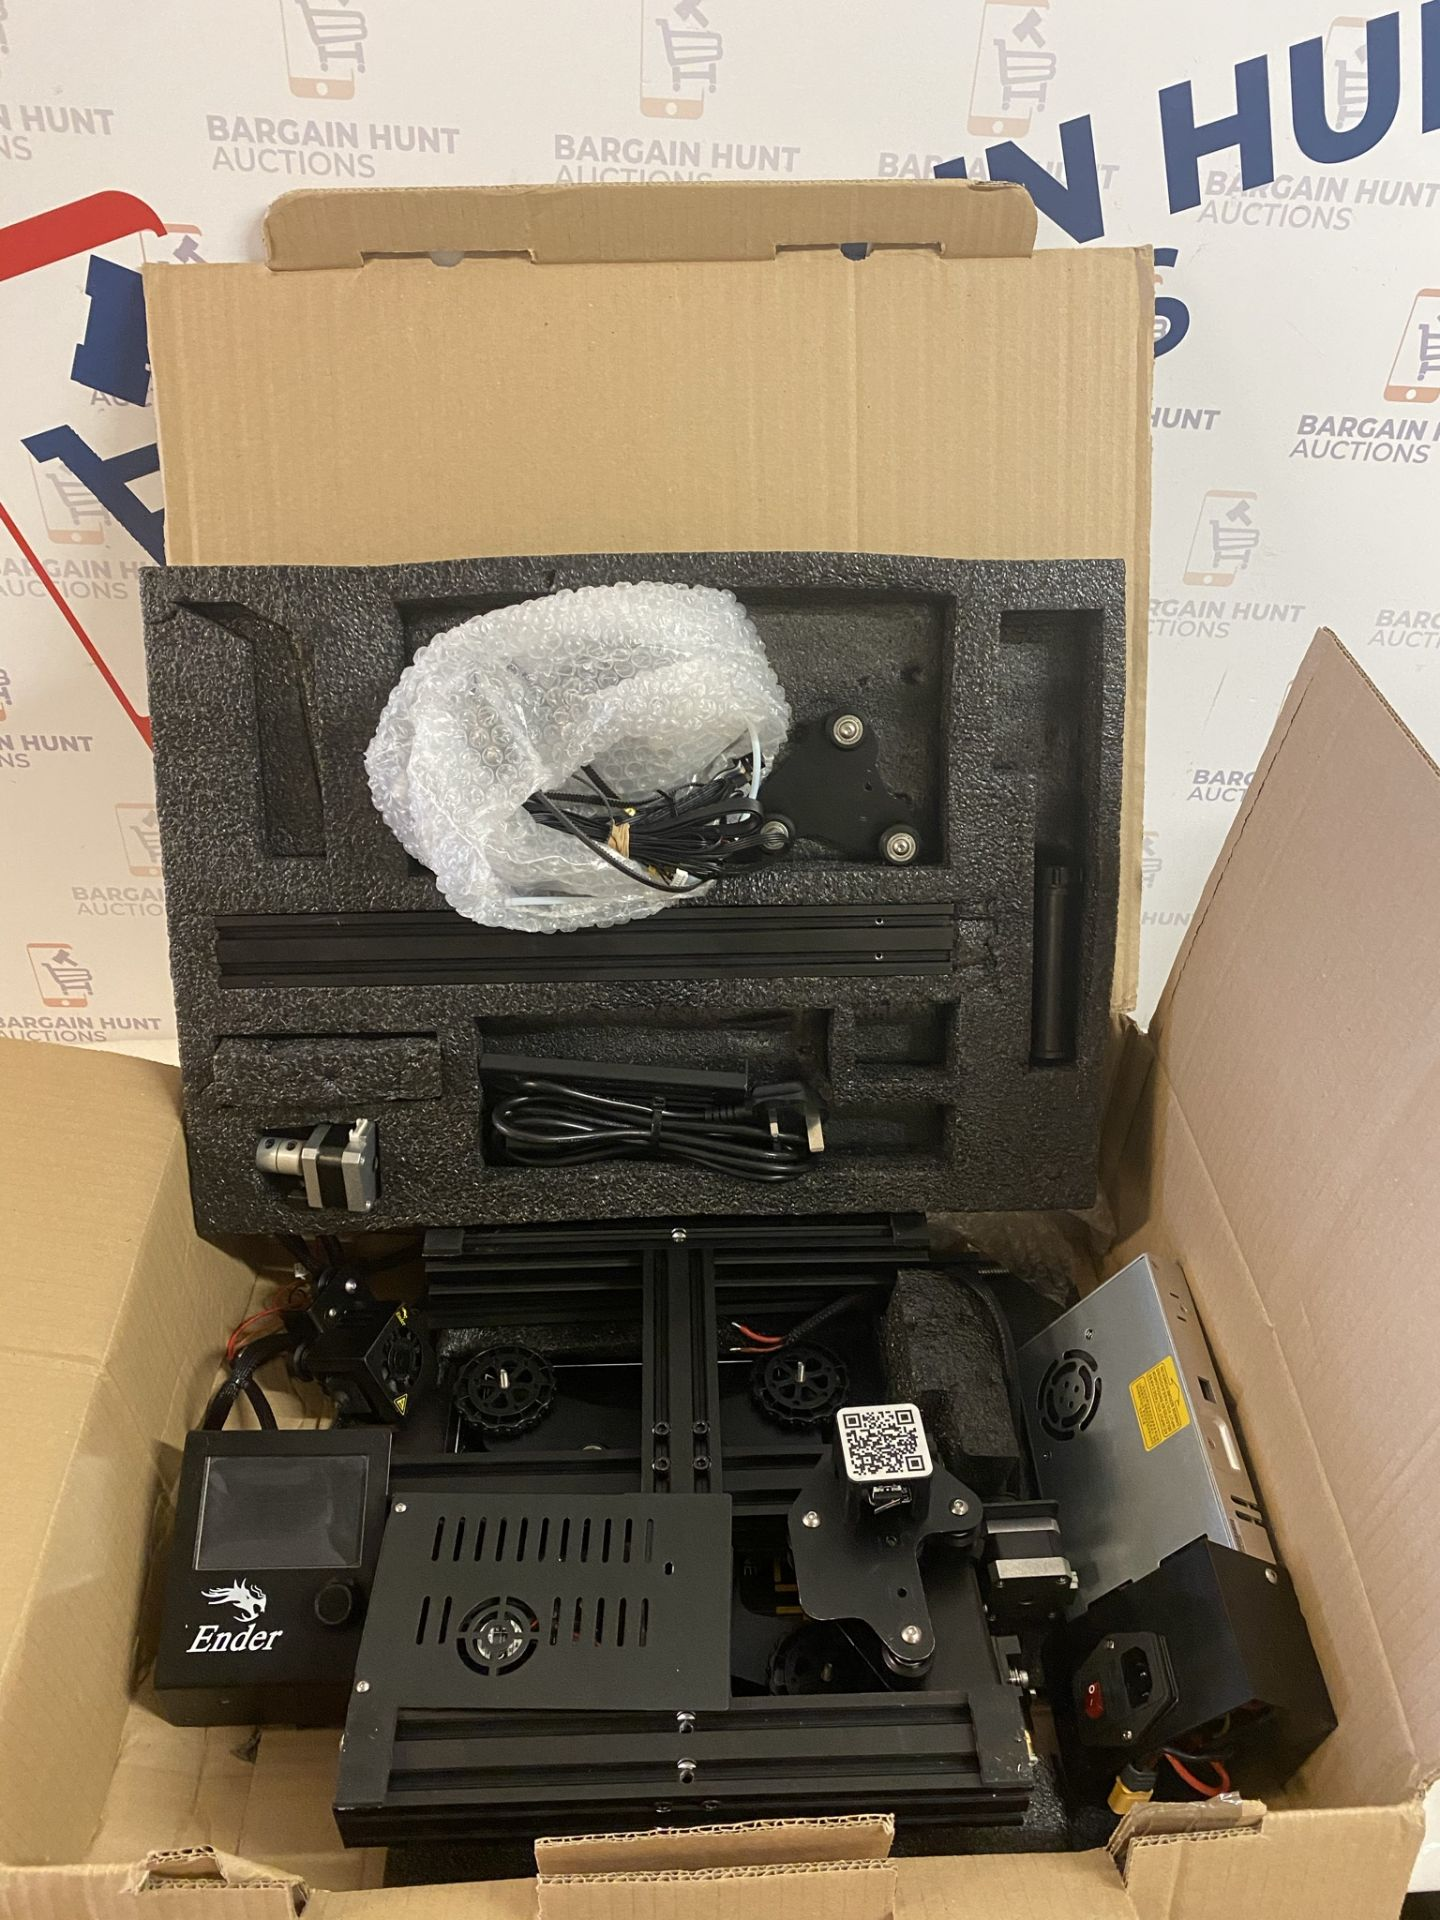 Comgrow Creality Ender 3 Pro 3D Printer RRP £235